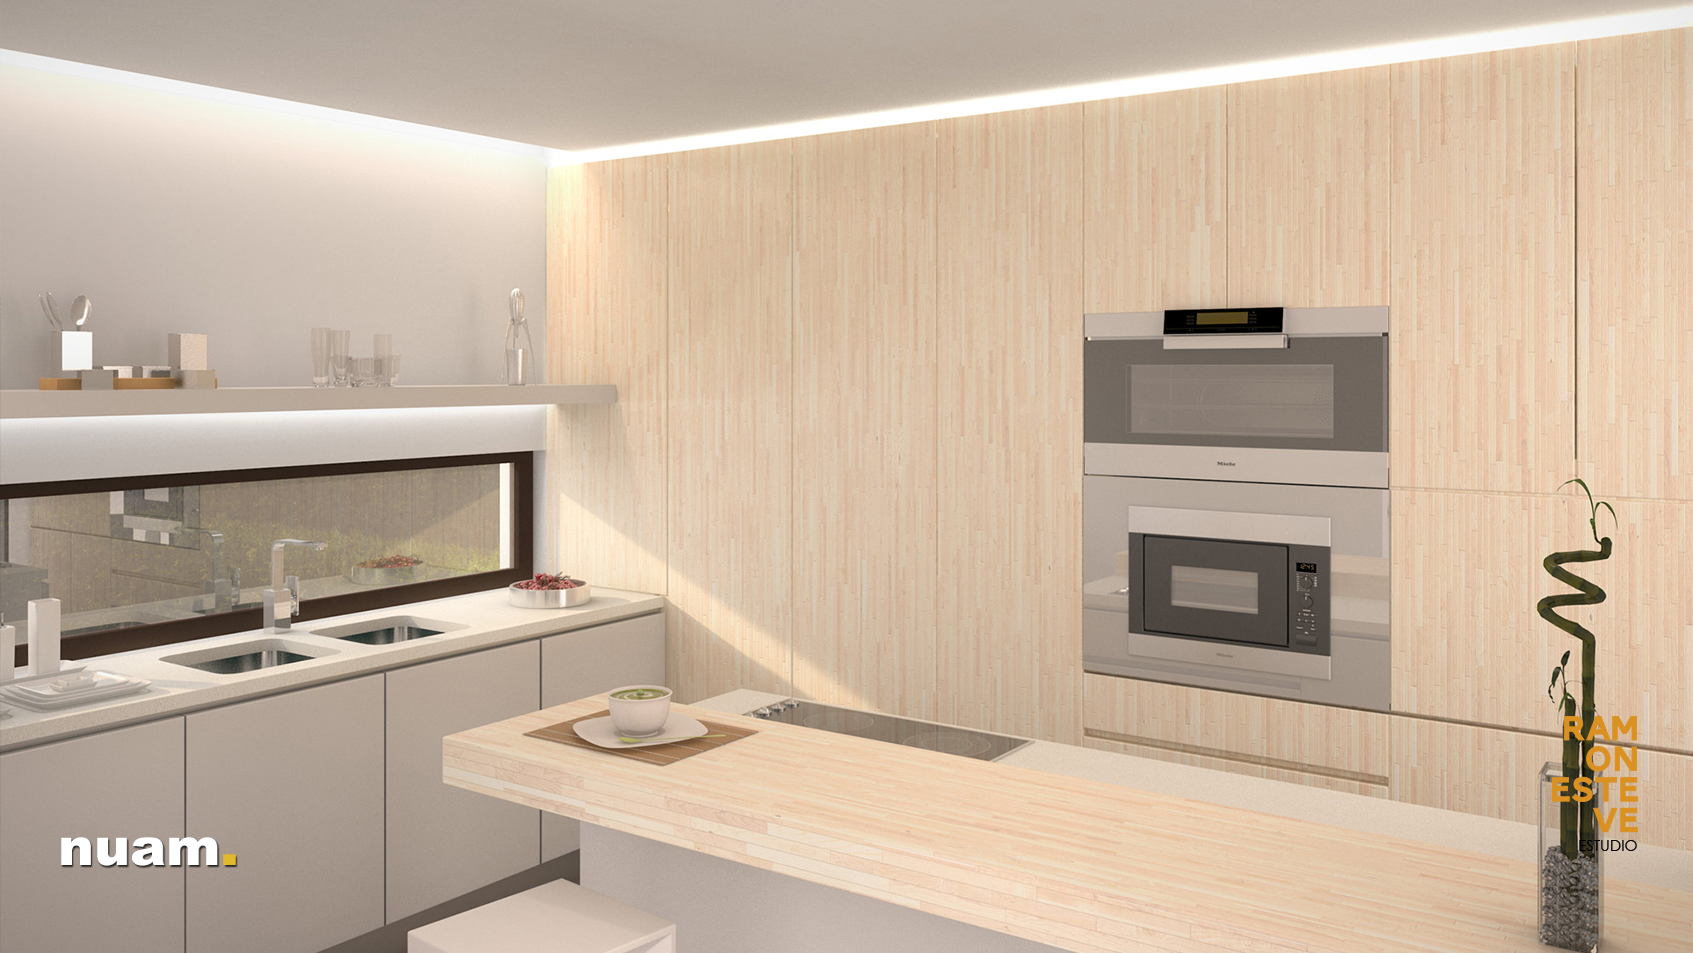 Kitchen at semi detached luxury villas in moraira spain by ramón esteve